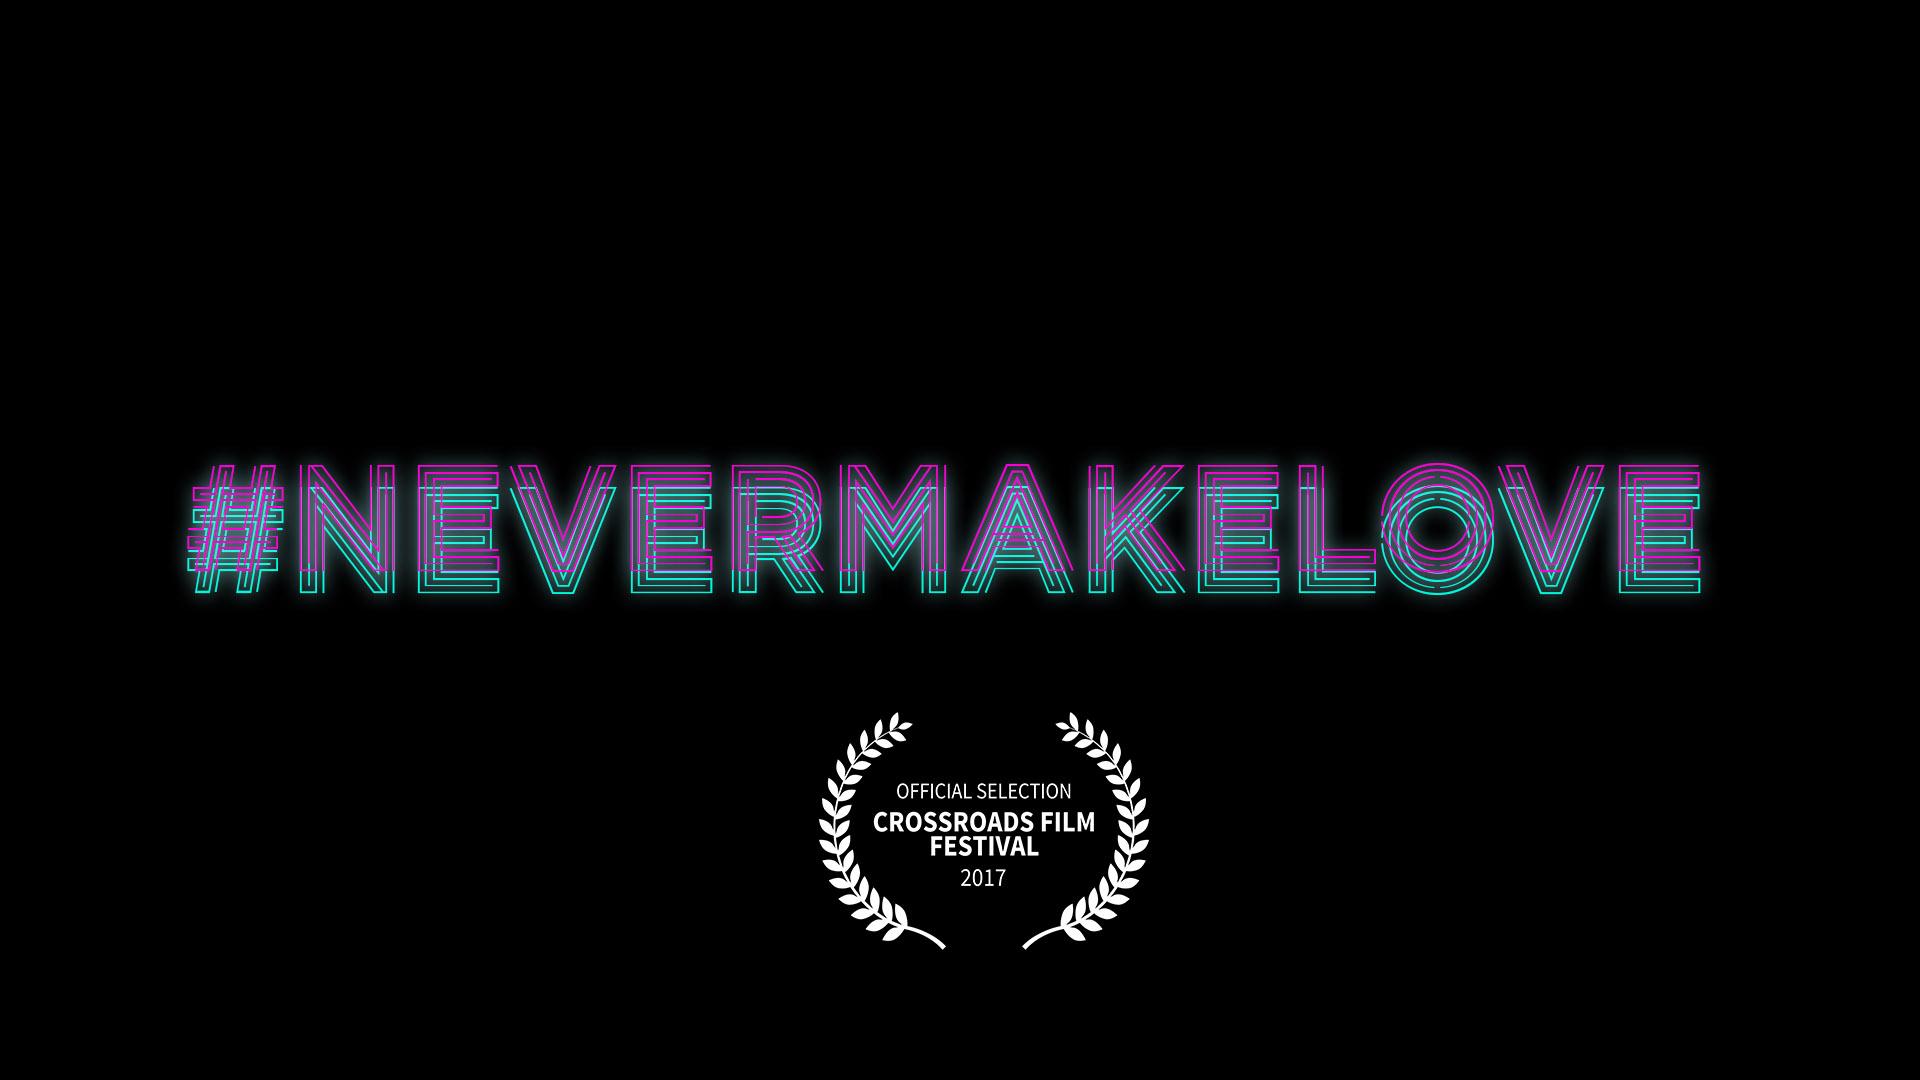 #NEVERMAKELOVE